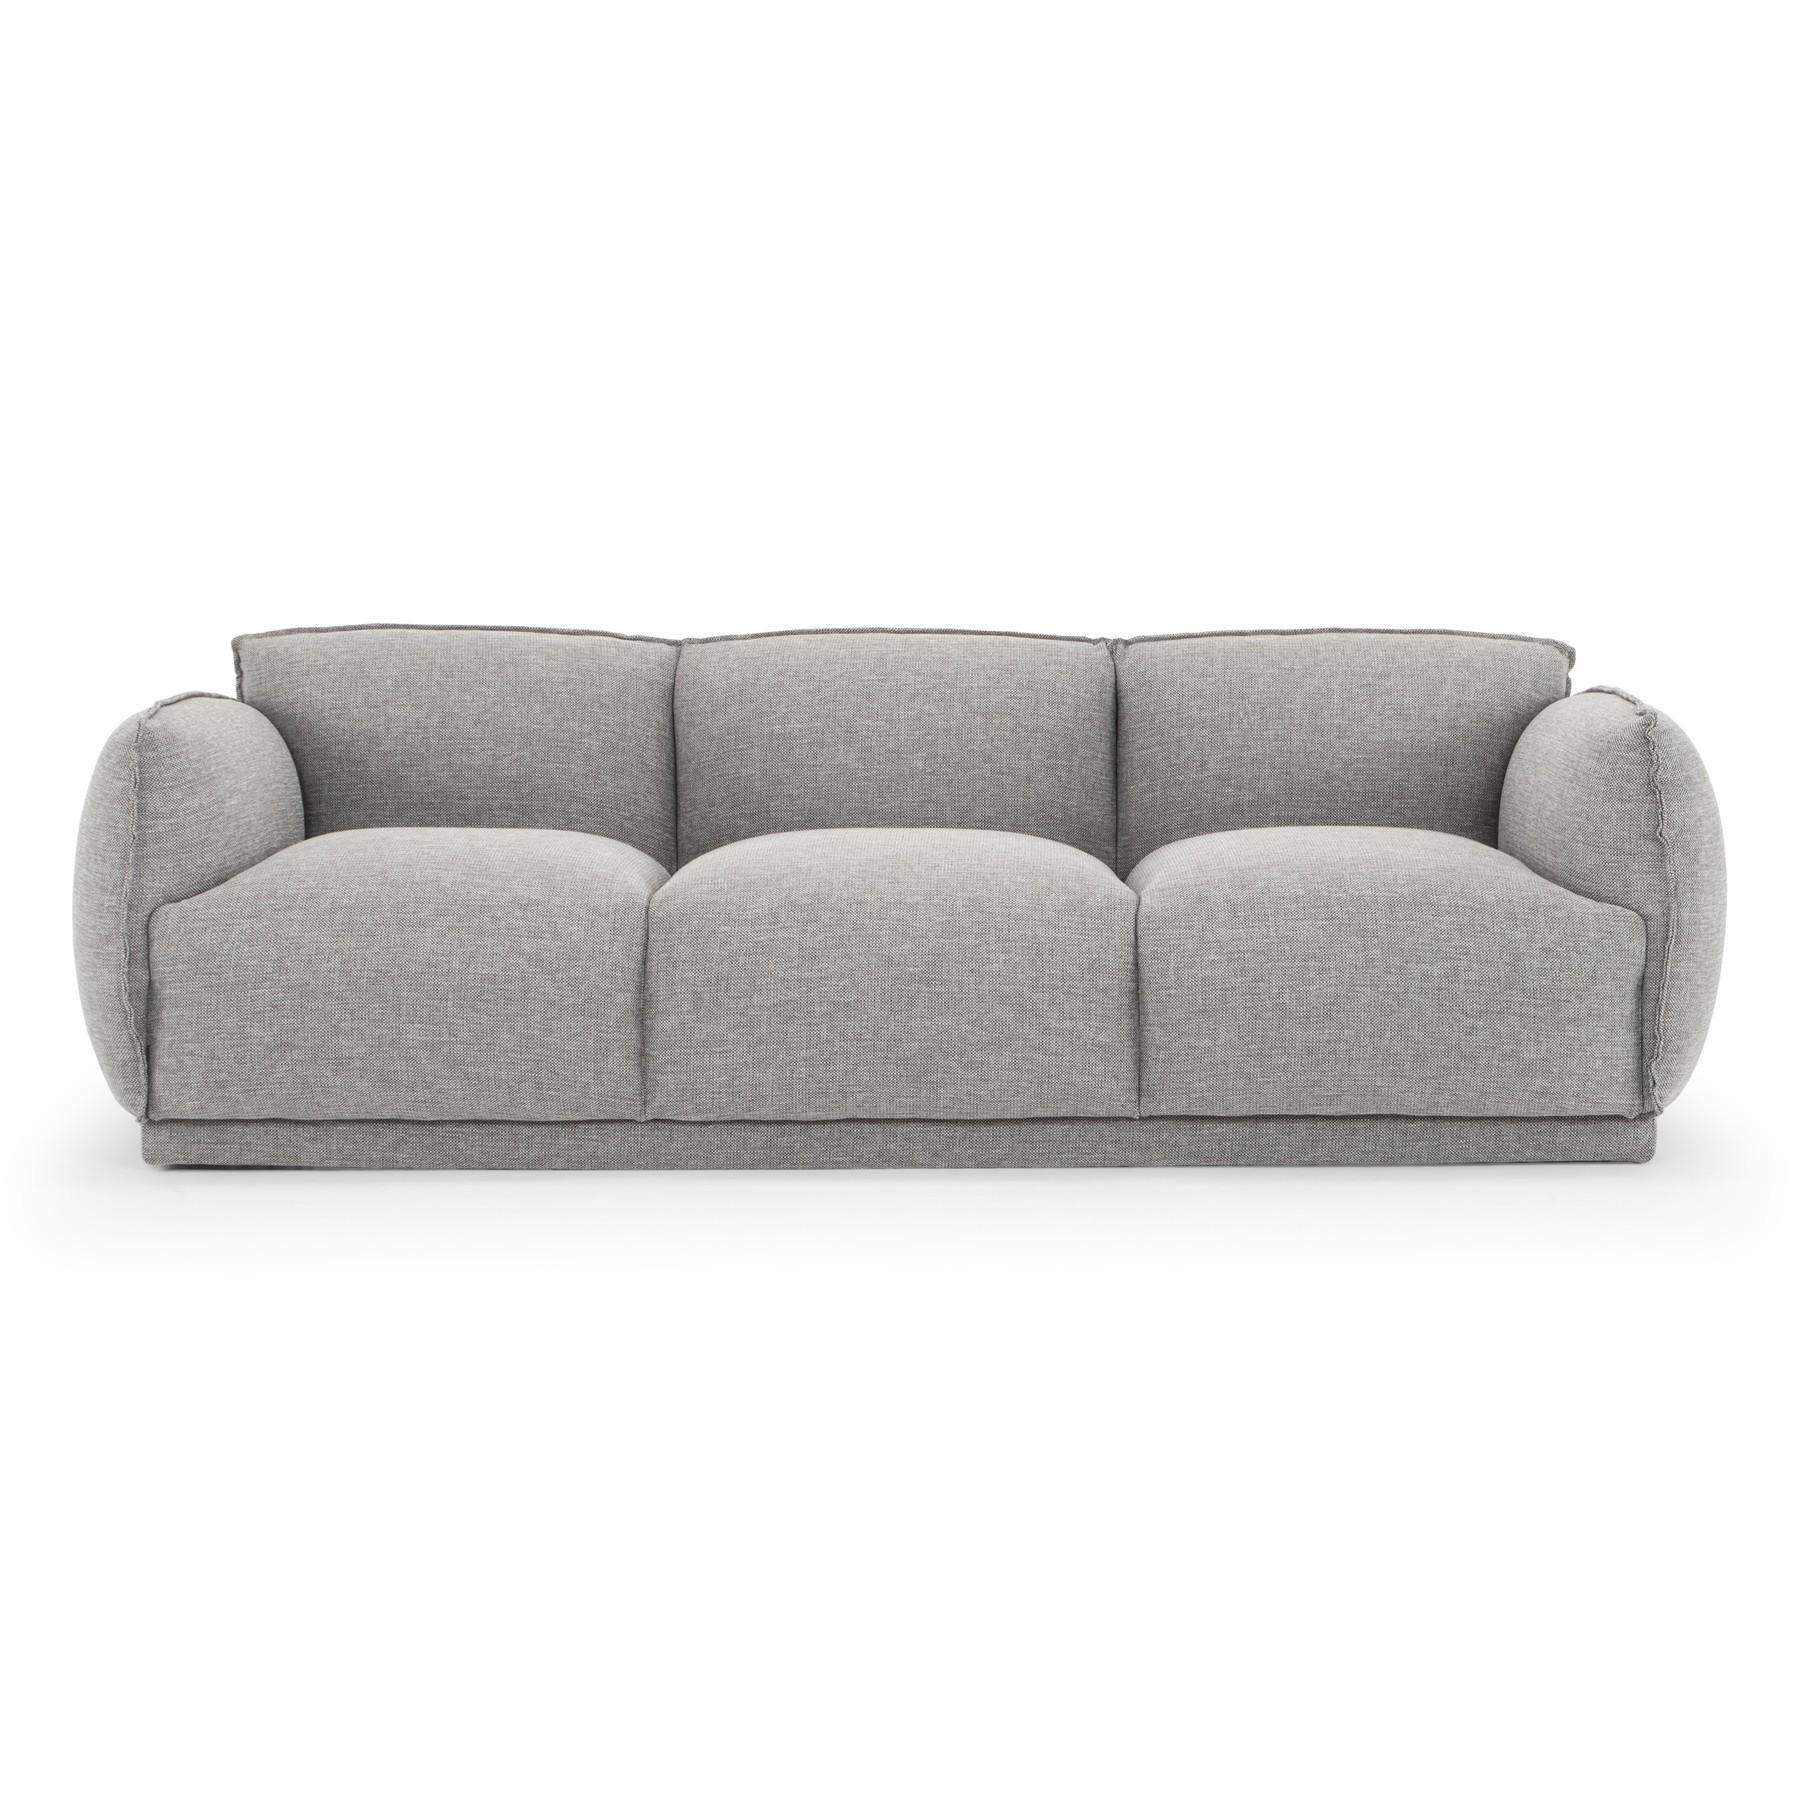 Euroa Fabric Sofa, 3 Seater, Graphite Grey